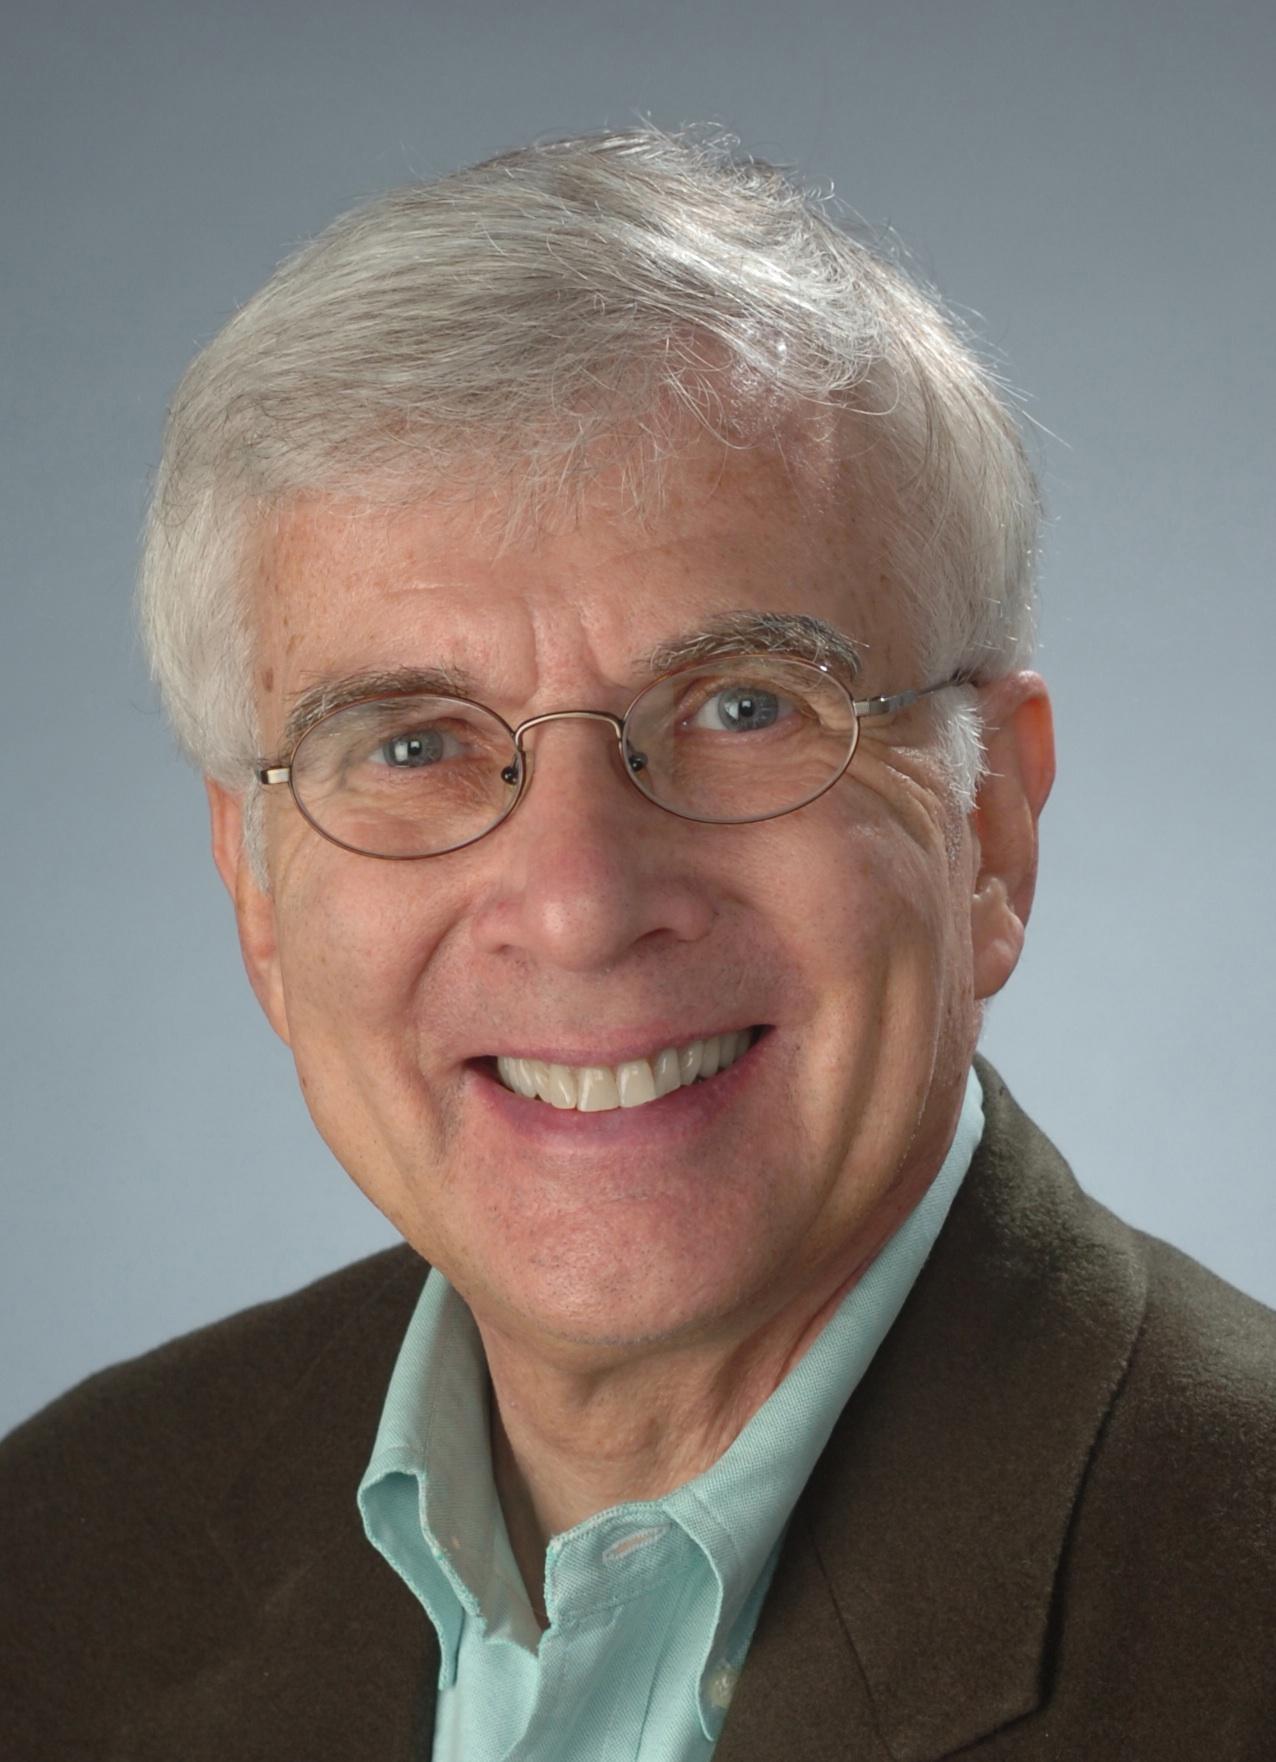 Mark Monmonier